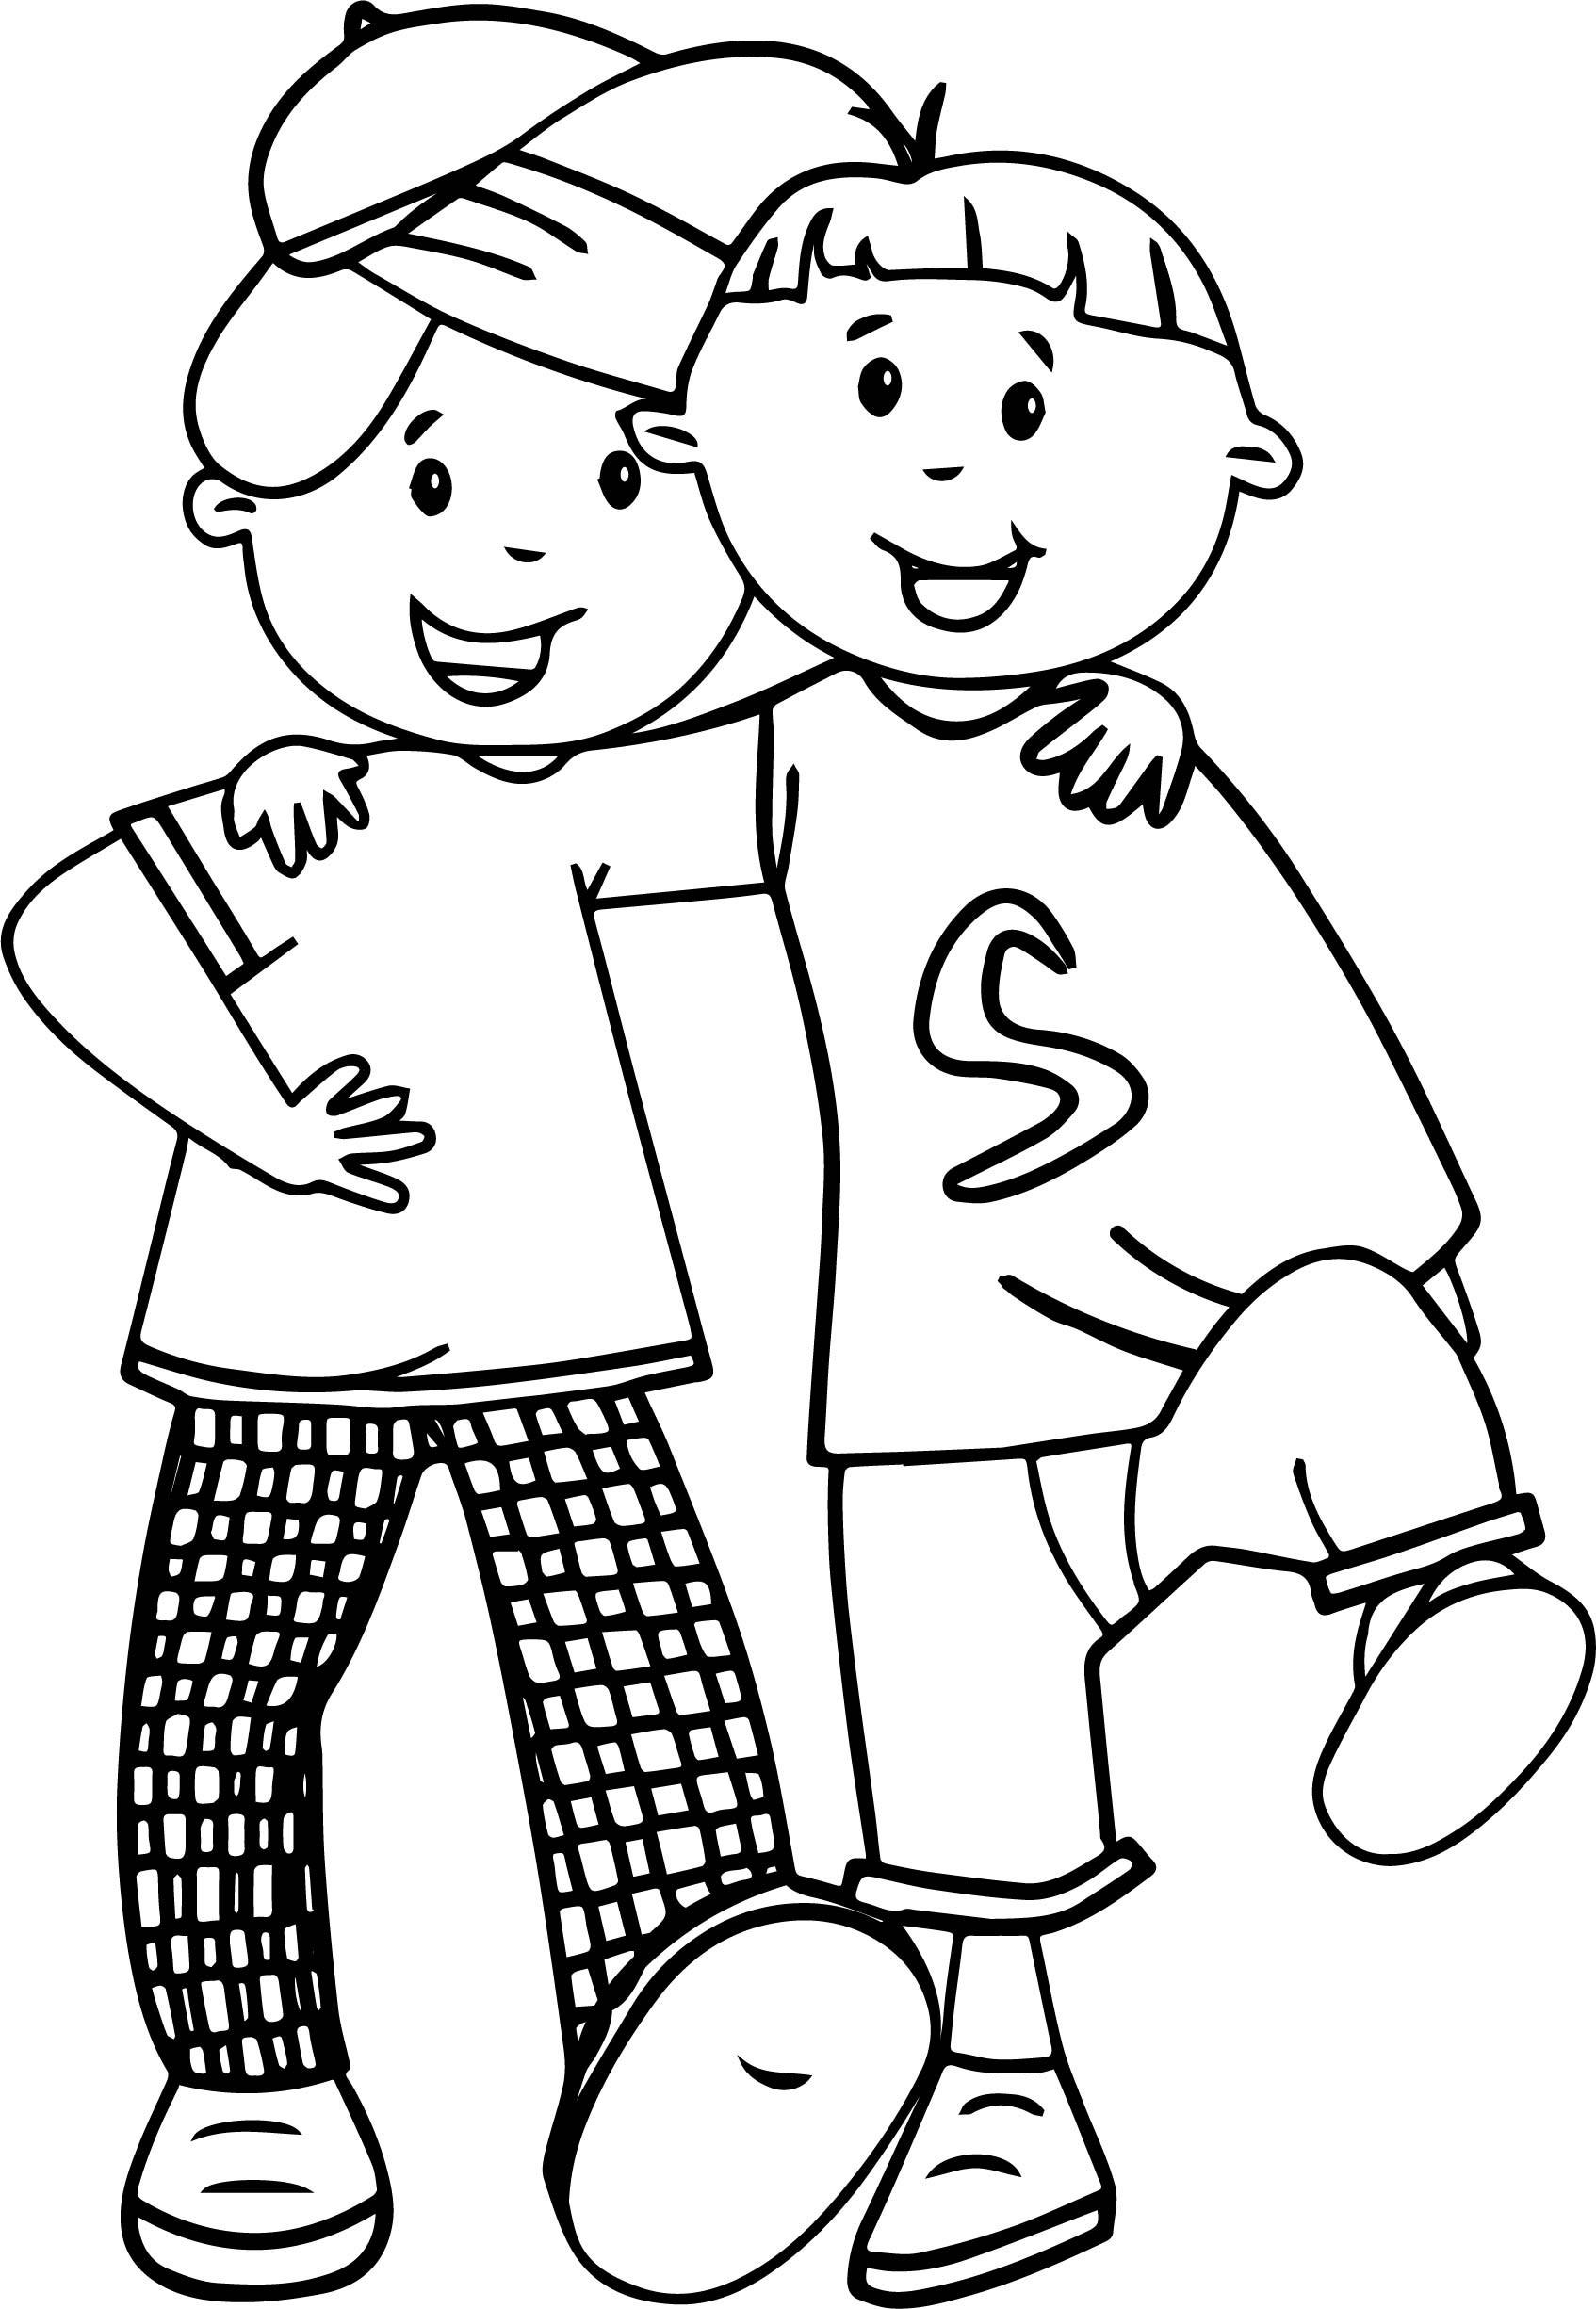 Friends Cartoon Drawing At Getdrawings